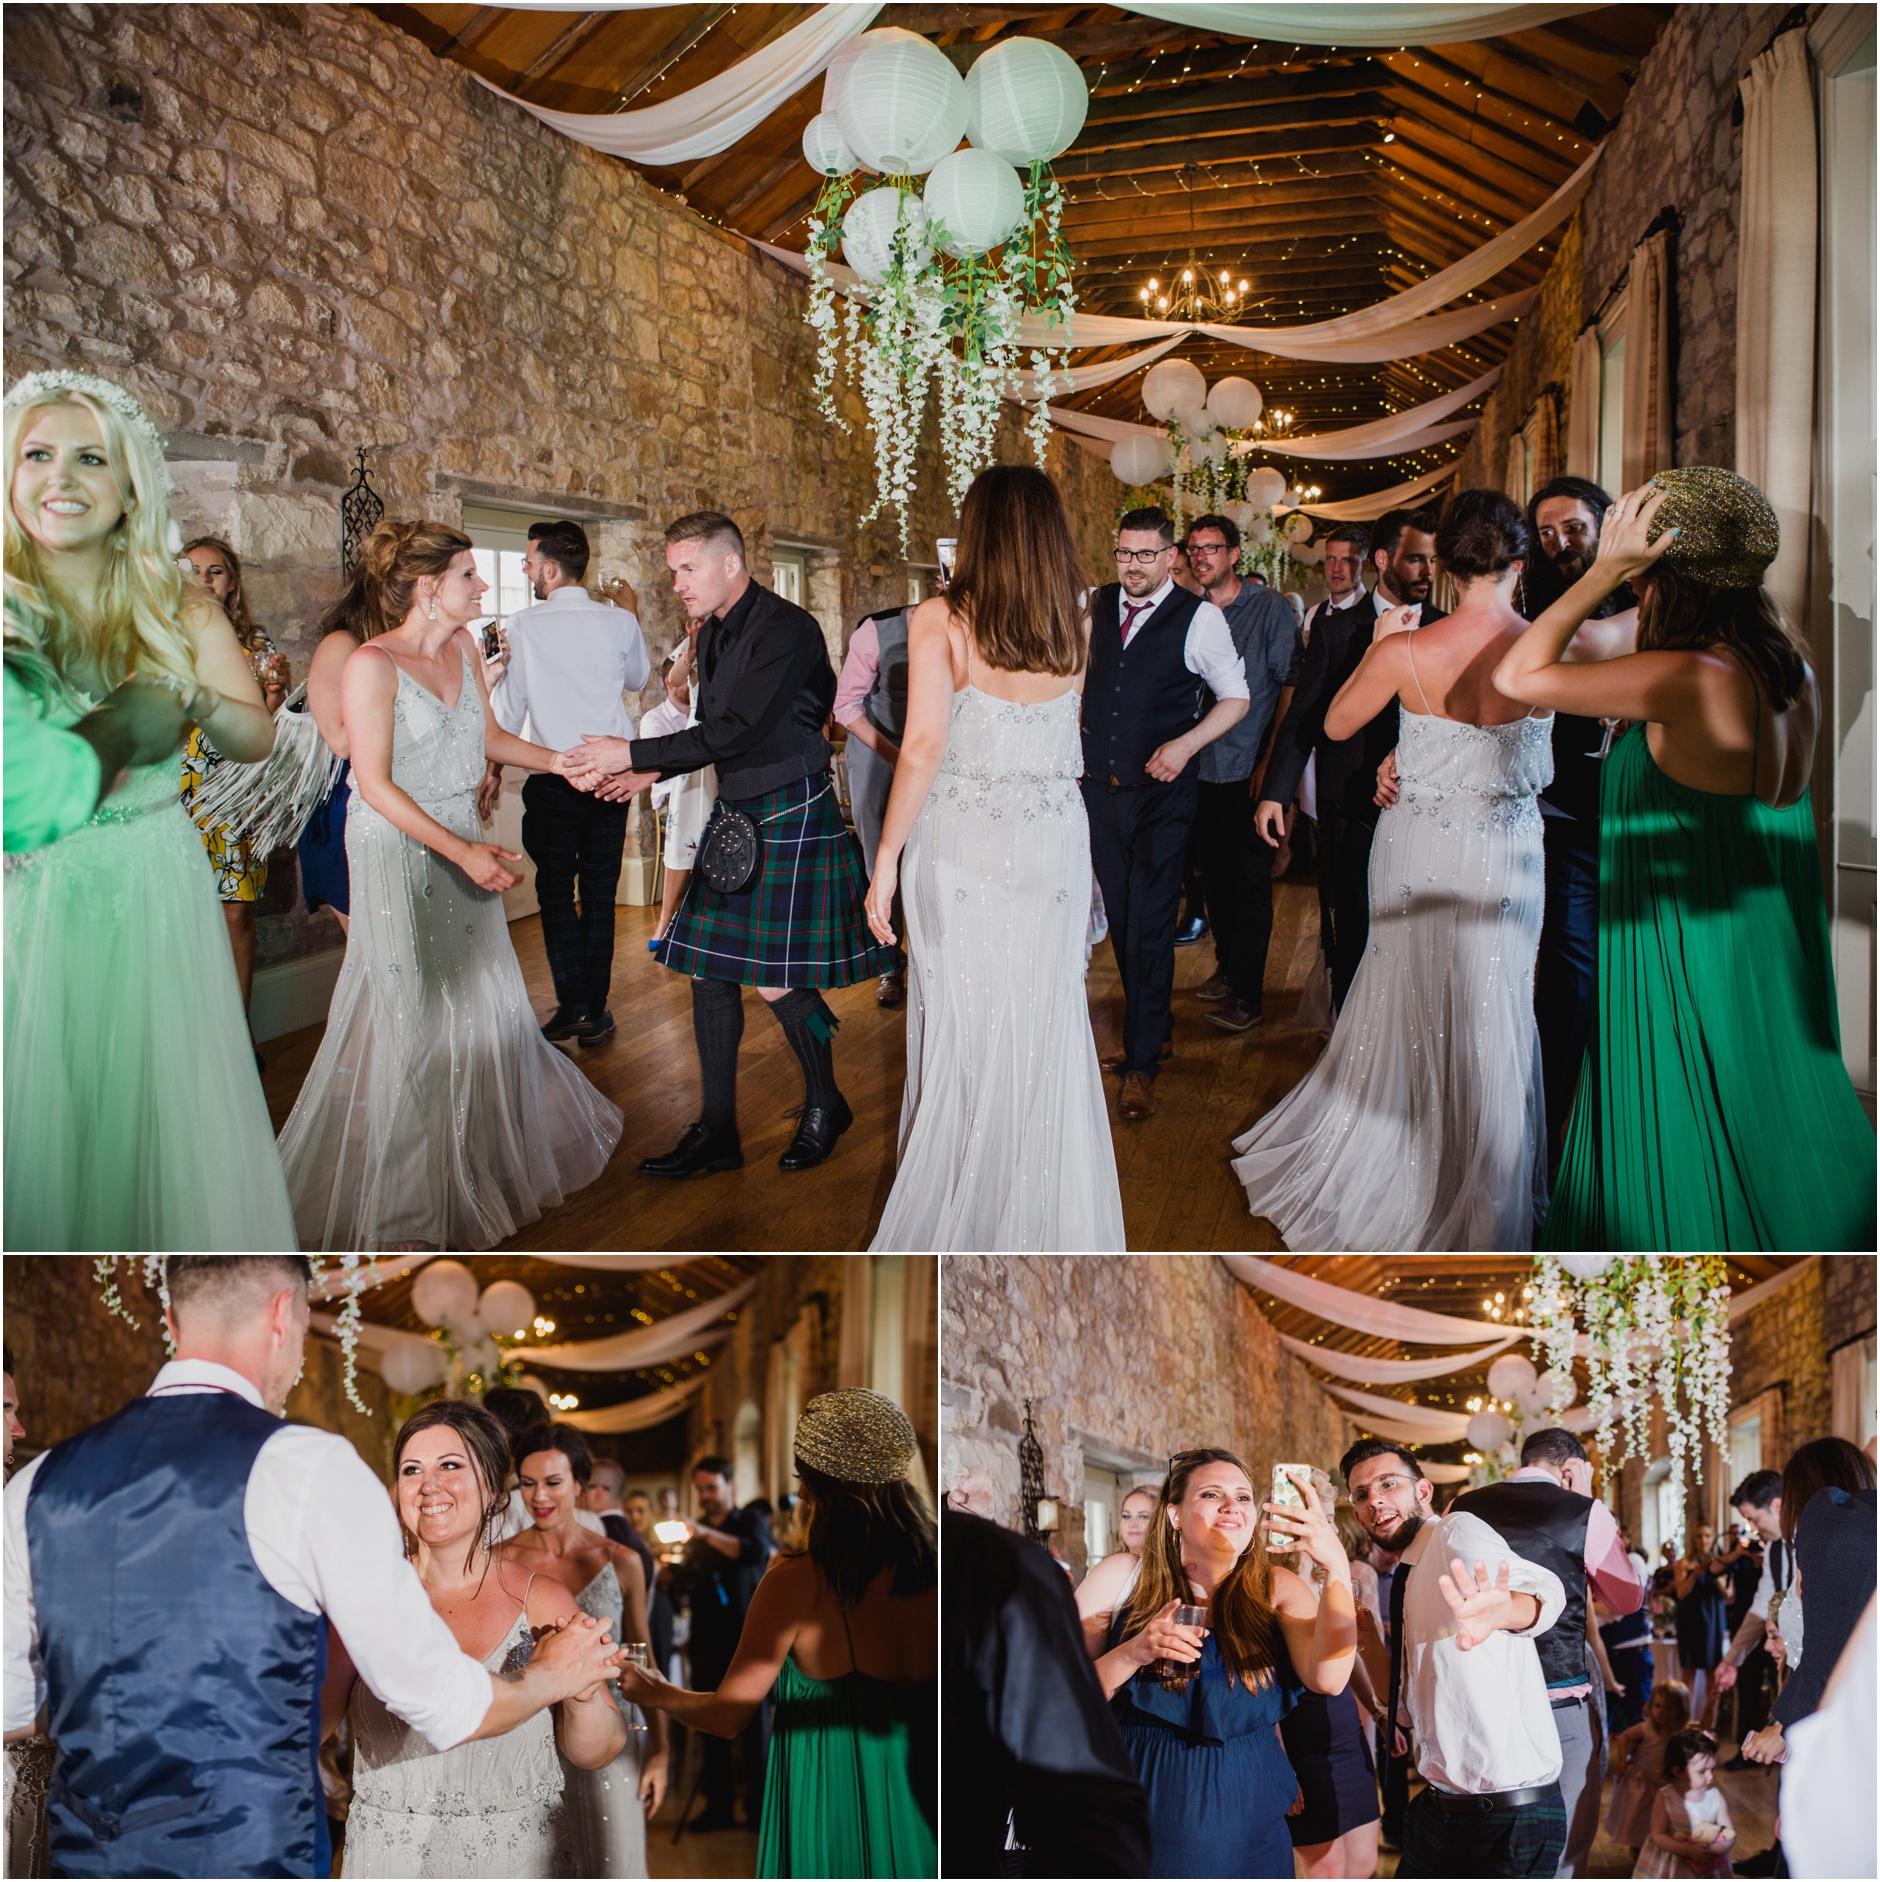 Sunny Summer Barn Wedding At Kirknewton Stables